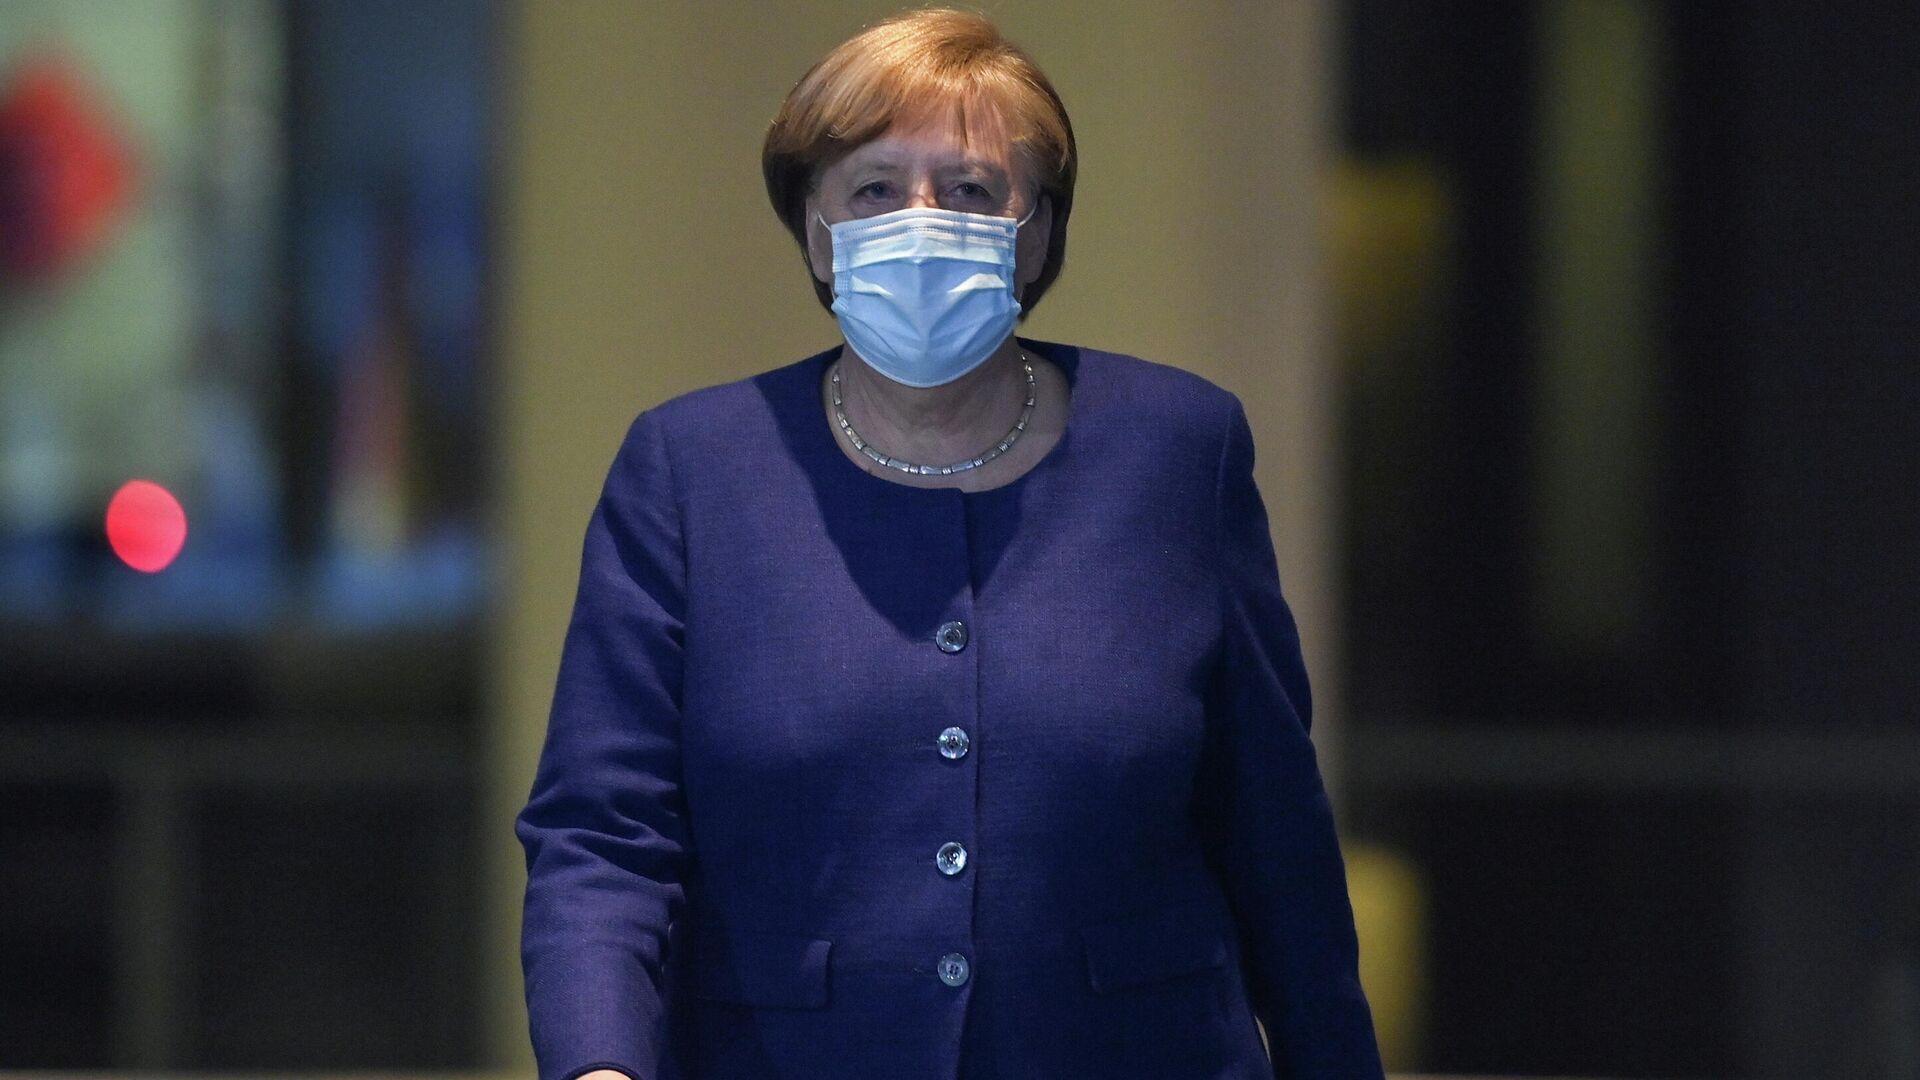 Angela Merkel, canciller federal alemana - Sputnik Mundo, 1920, 01.03.2021